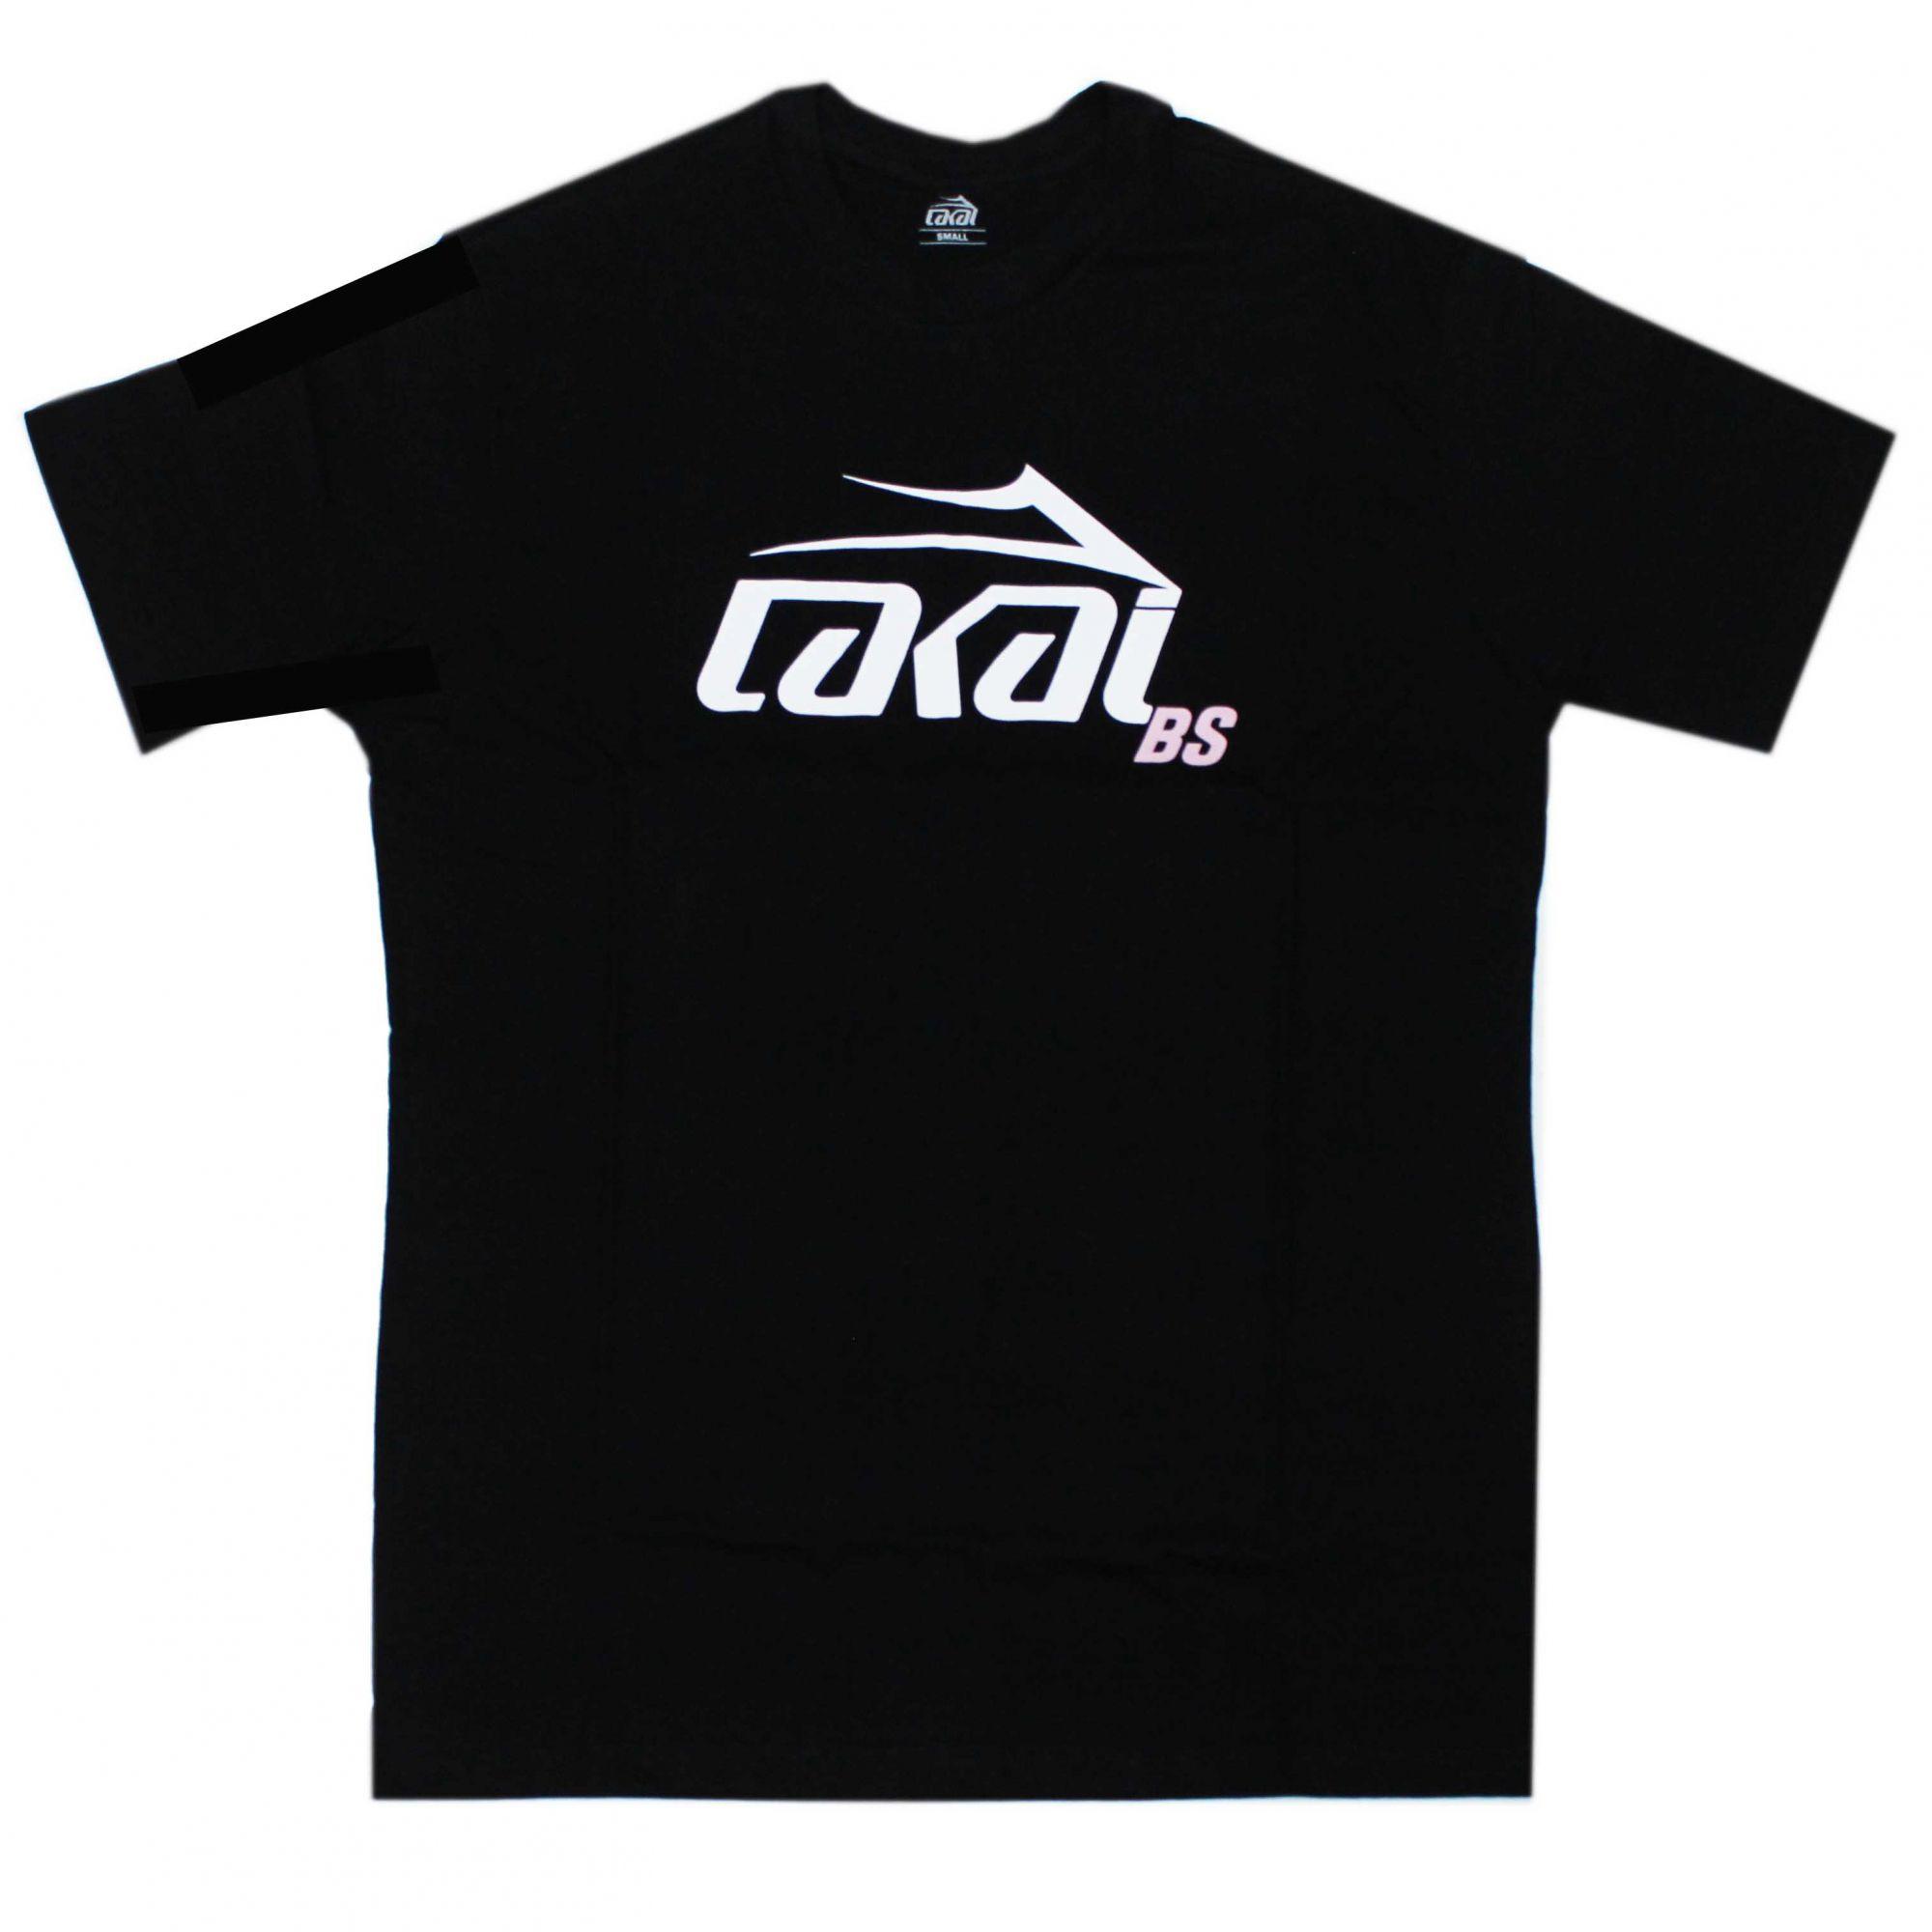 Camiseta Lakai Bullshit - Preto